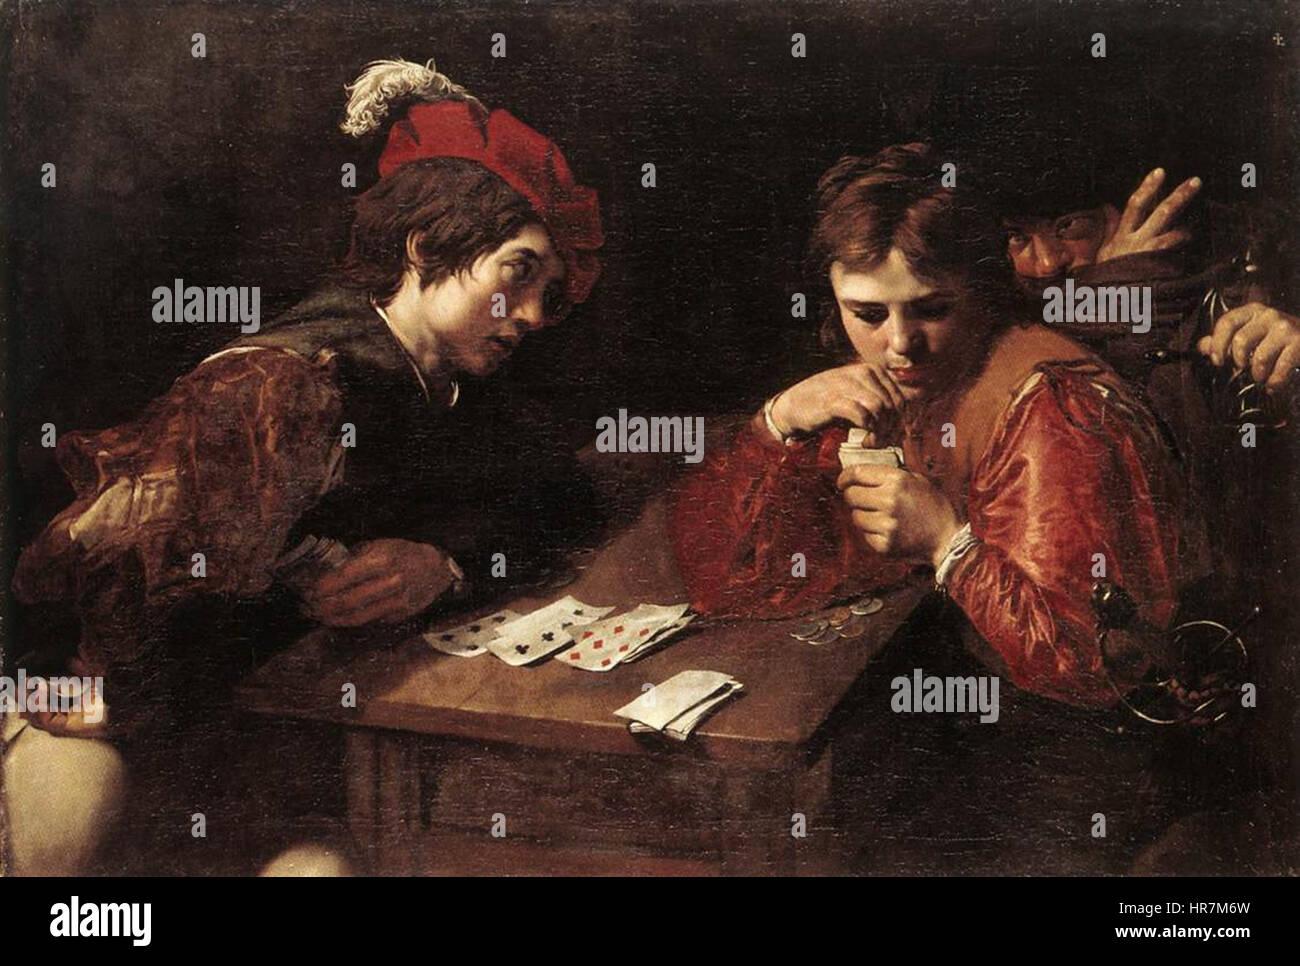 Valentin de Boulogne - Card-sharpers - WGA24233 - Stock Image